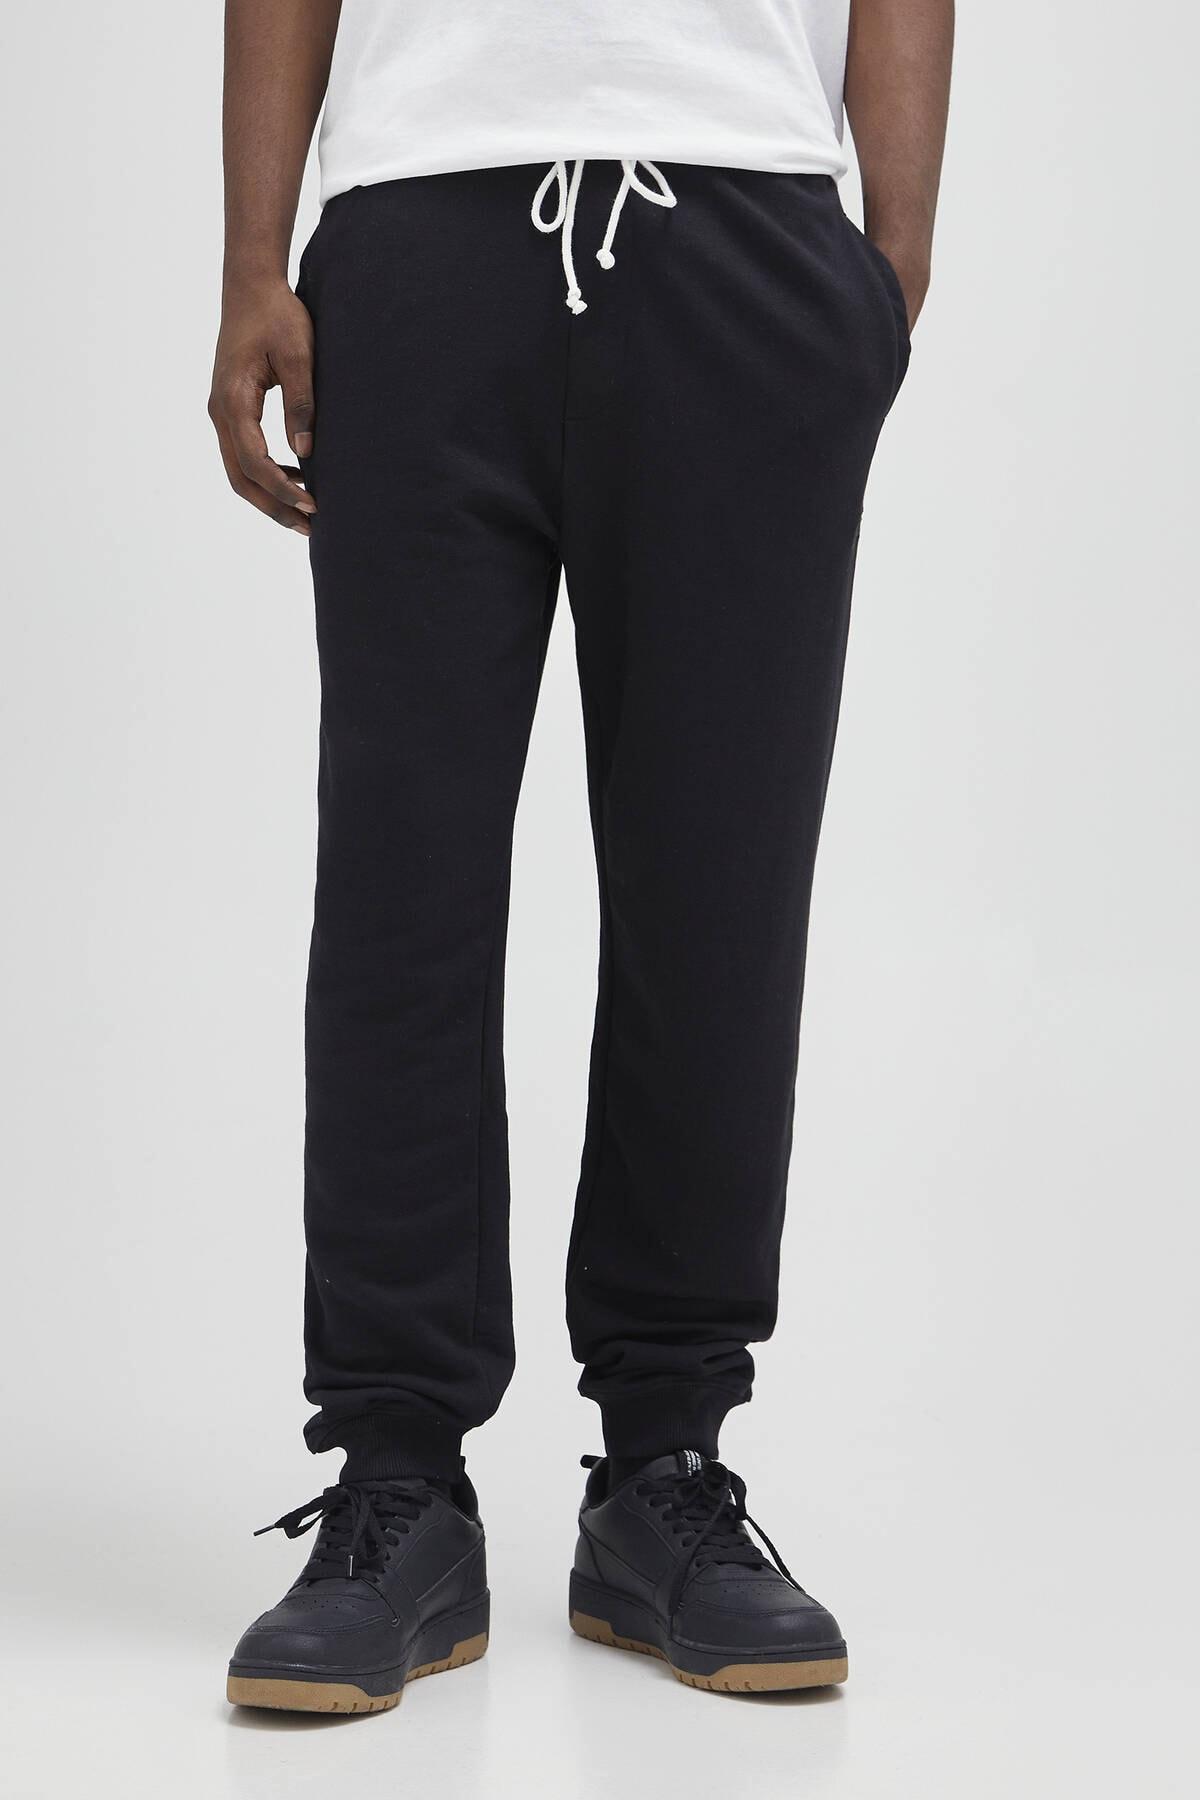 Pull & Bear Erkek Siyah Renkli Jogging Fit Pantolon 04676513 1